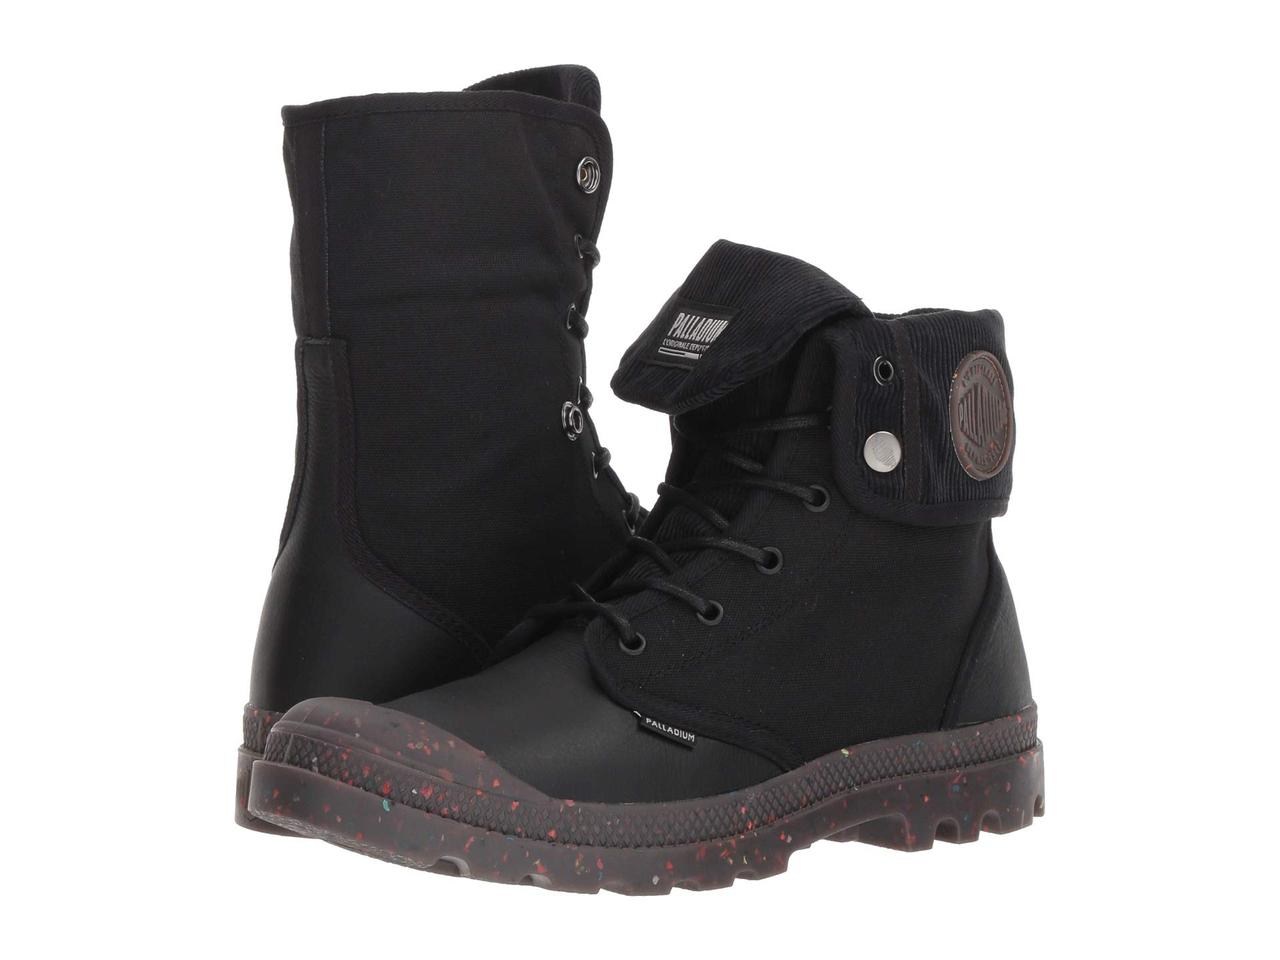 Ботинки Сапоги (Оригинал) Palladium Baggy Explorer Corduroy Black Black ddb8c4e13867b